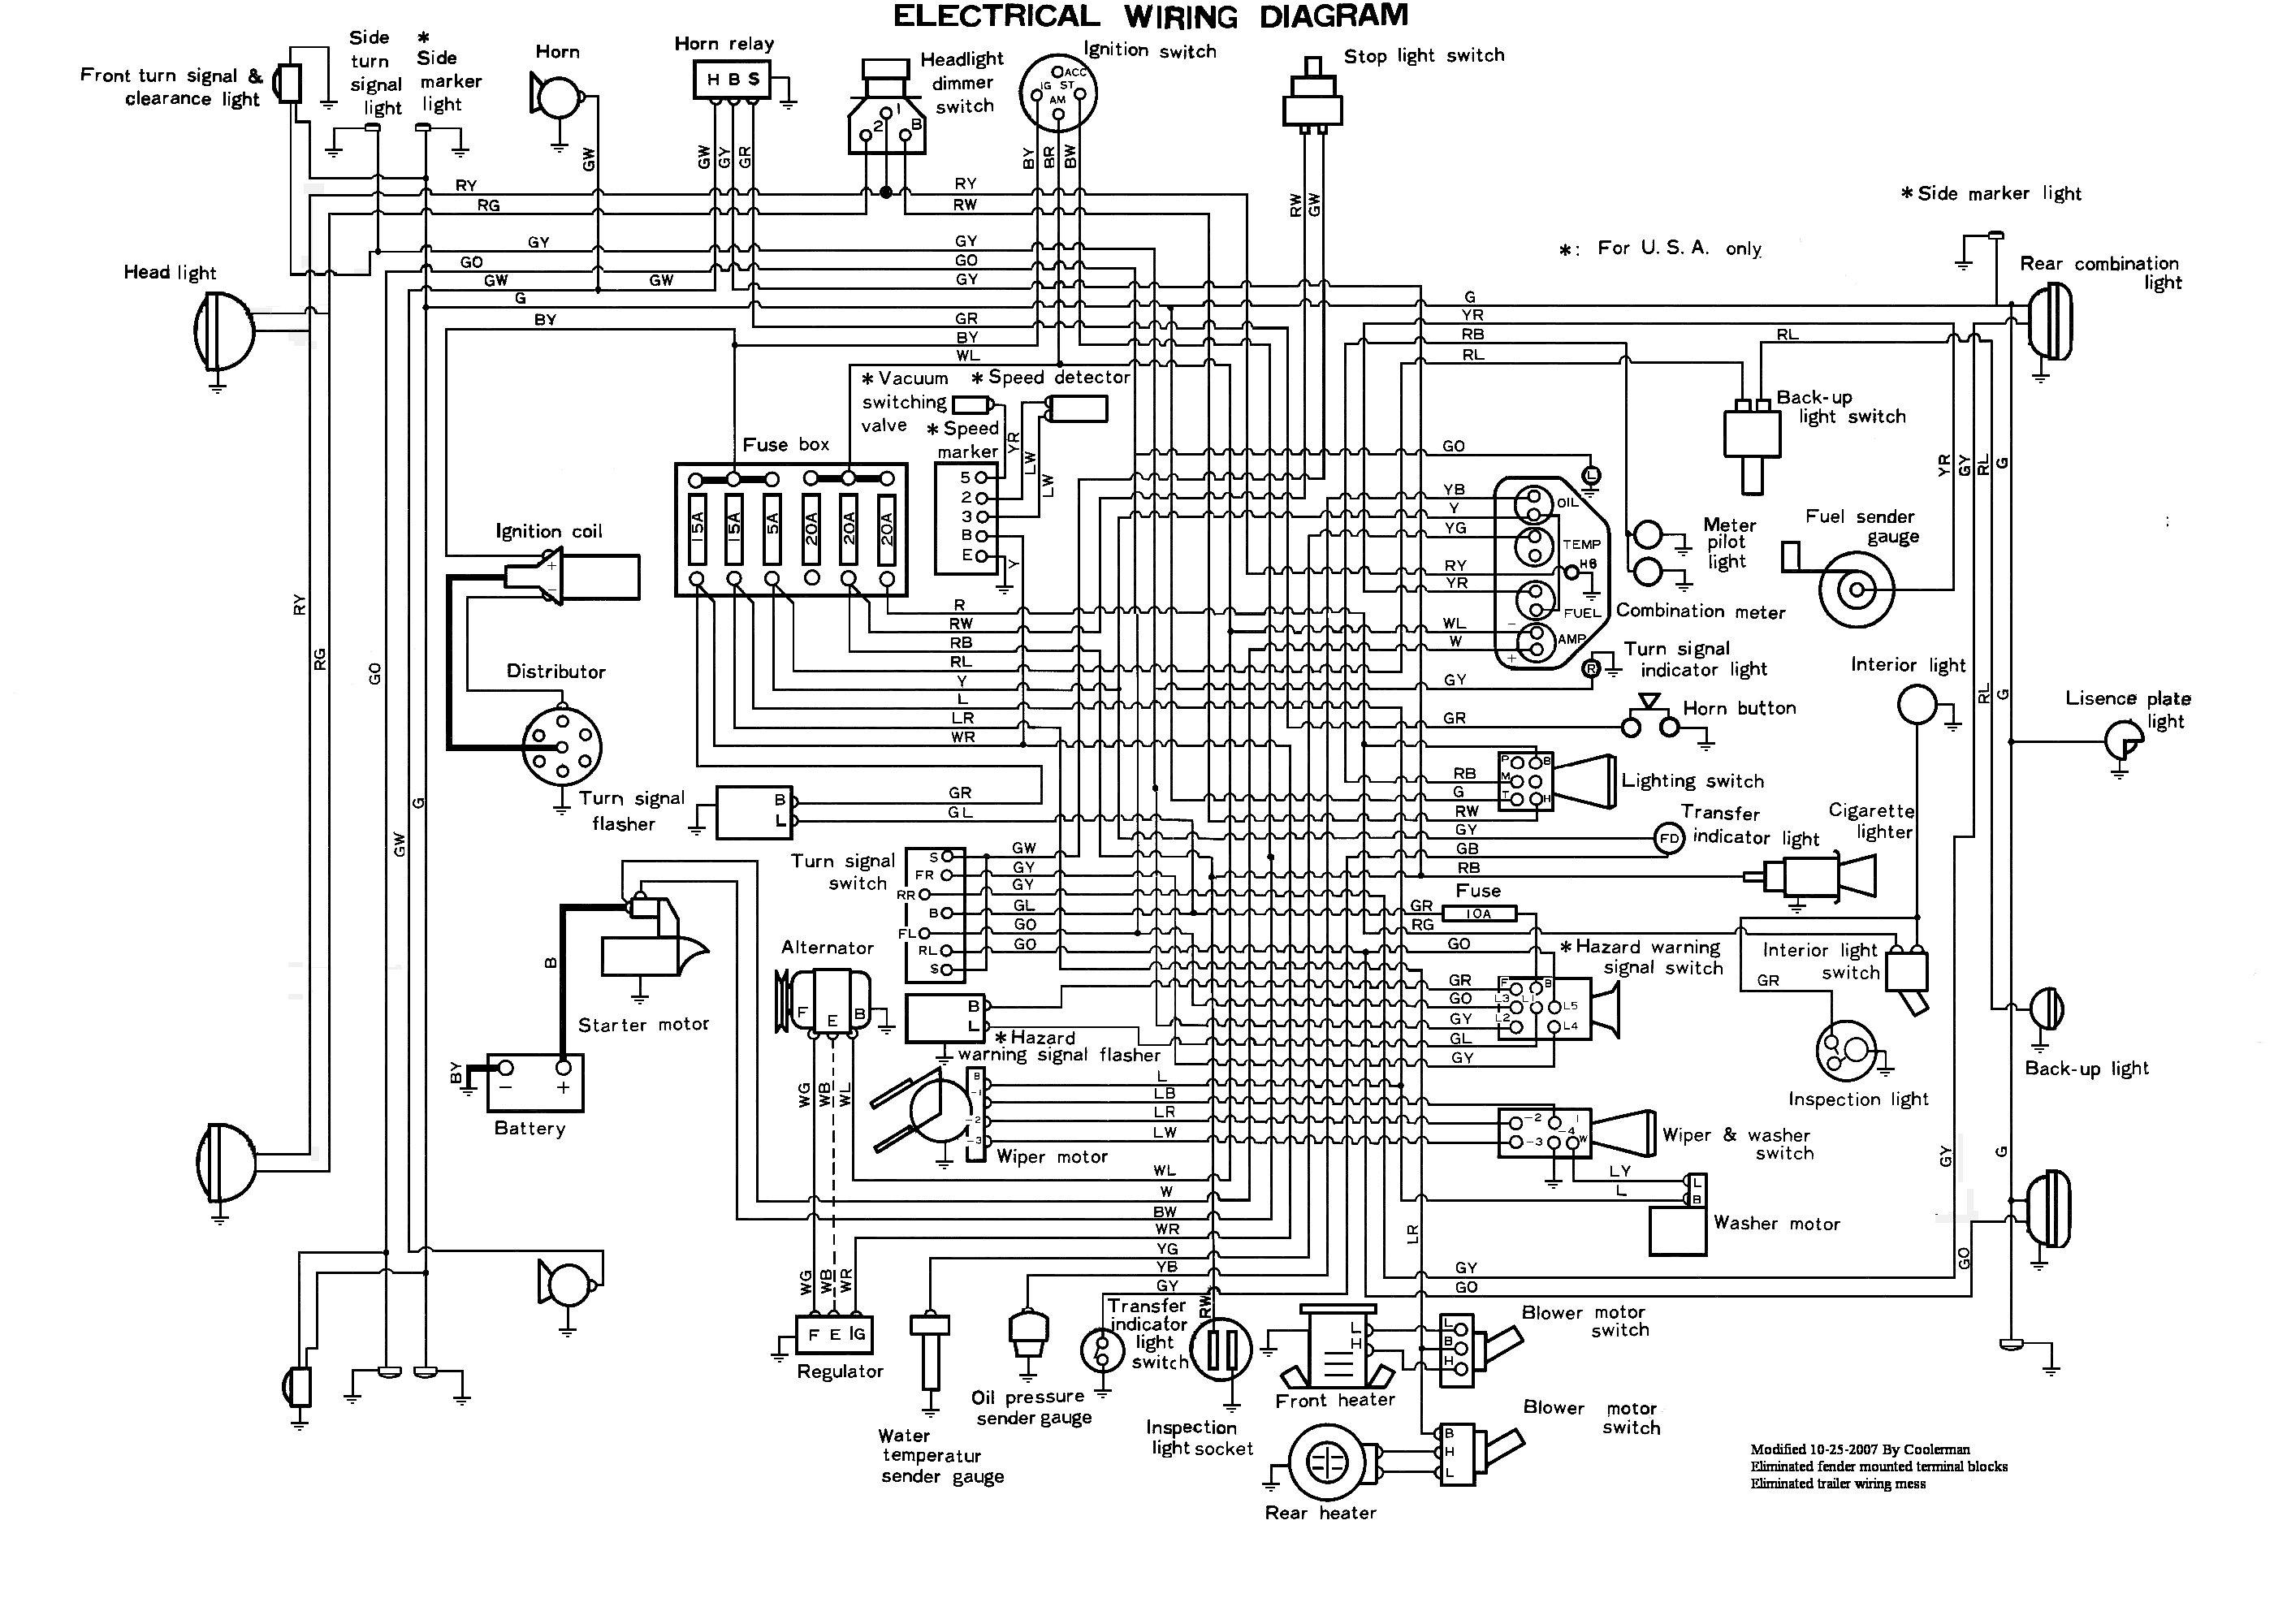 Fj Cruiser Trailer Wiring Diagram Toyota